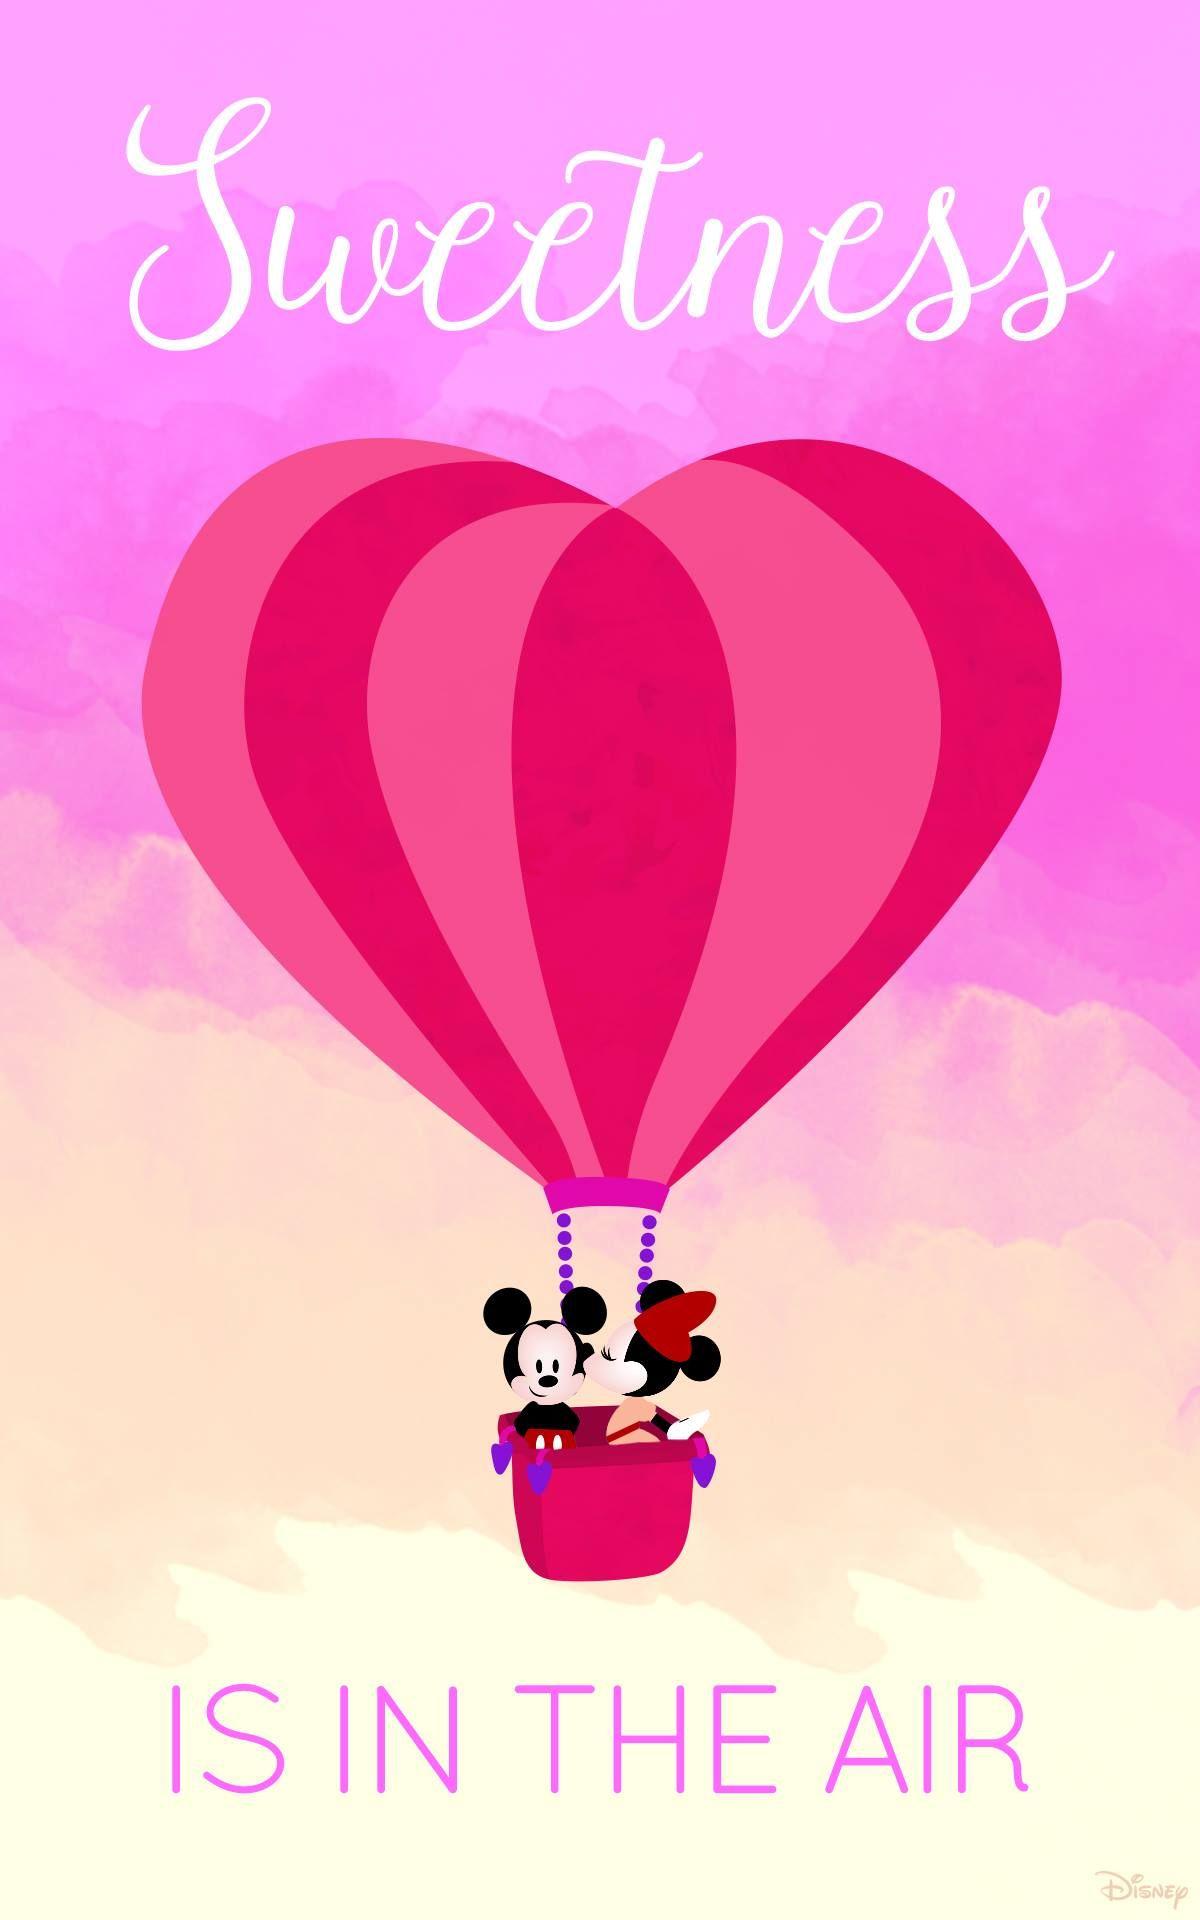 Disneyus mickey u minnie disney u mickey pinterest